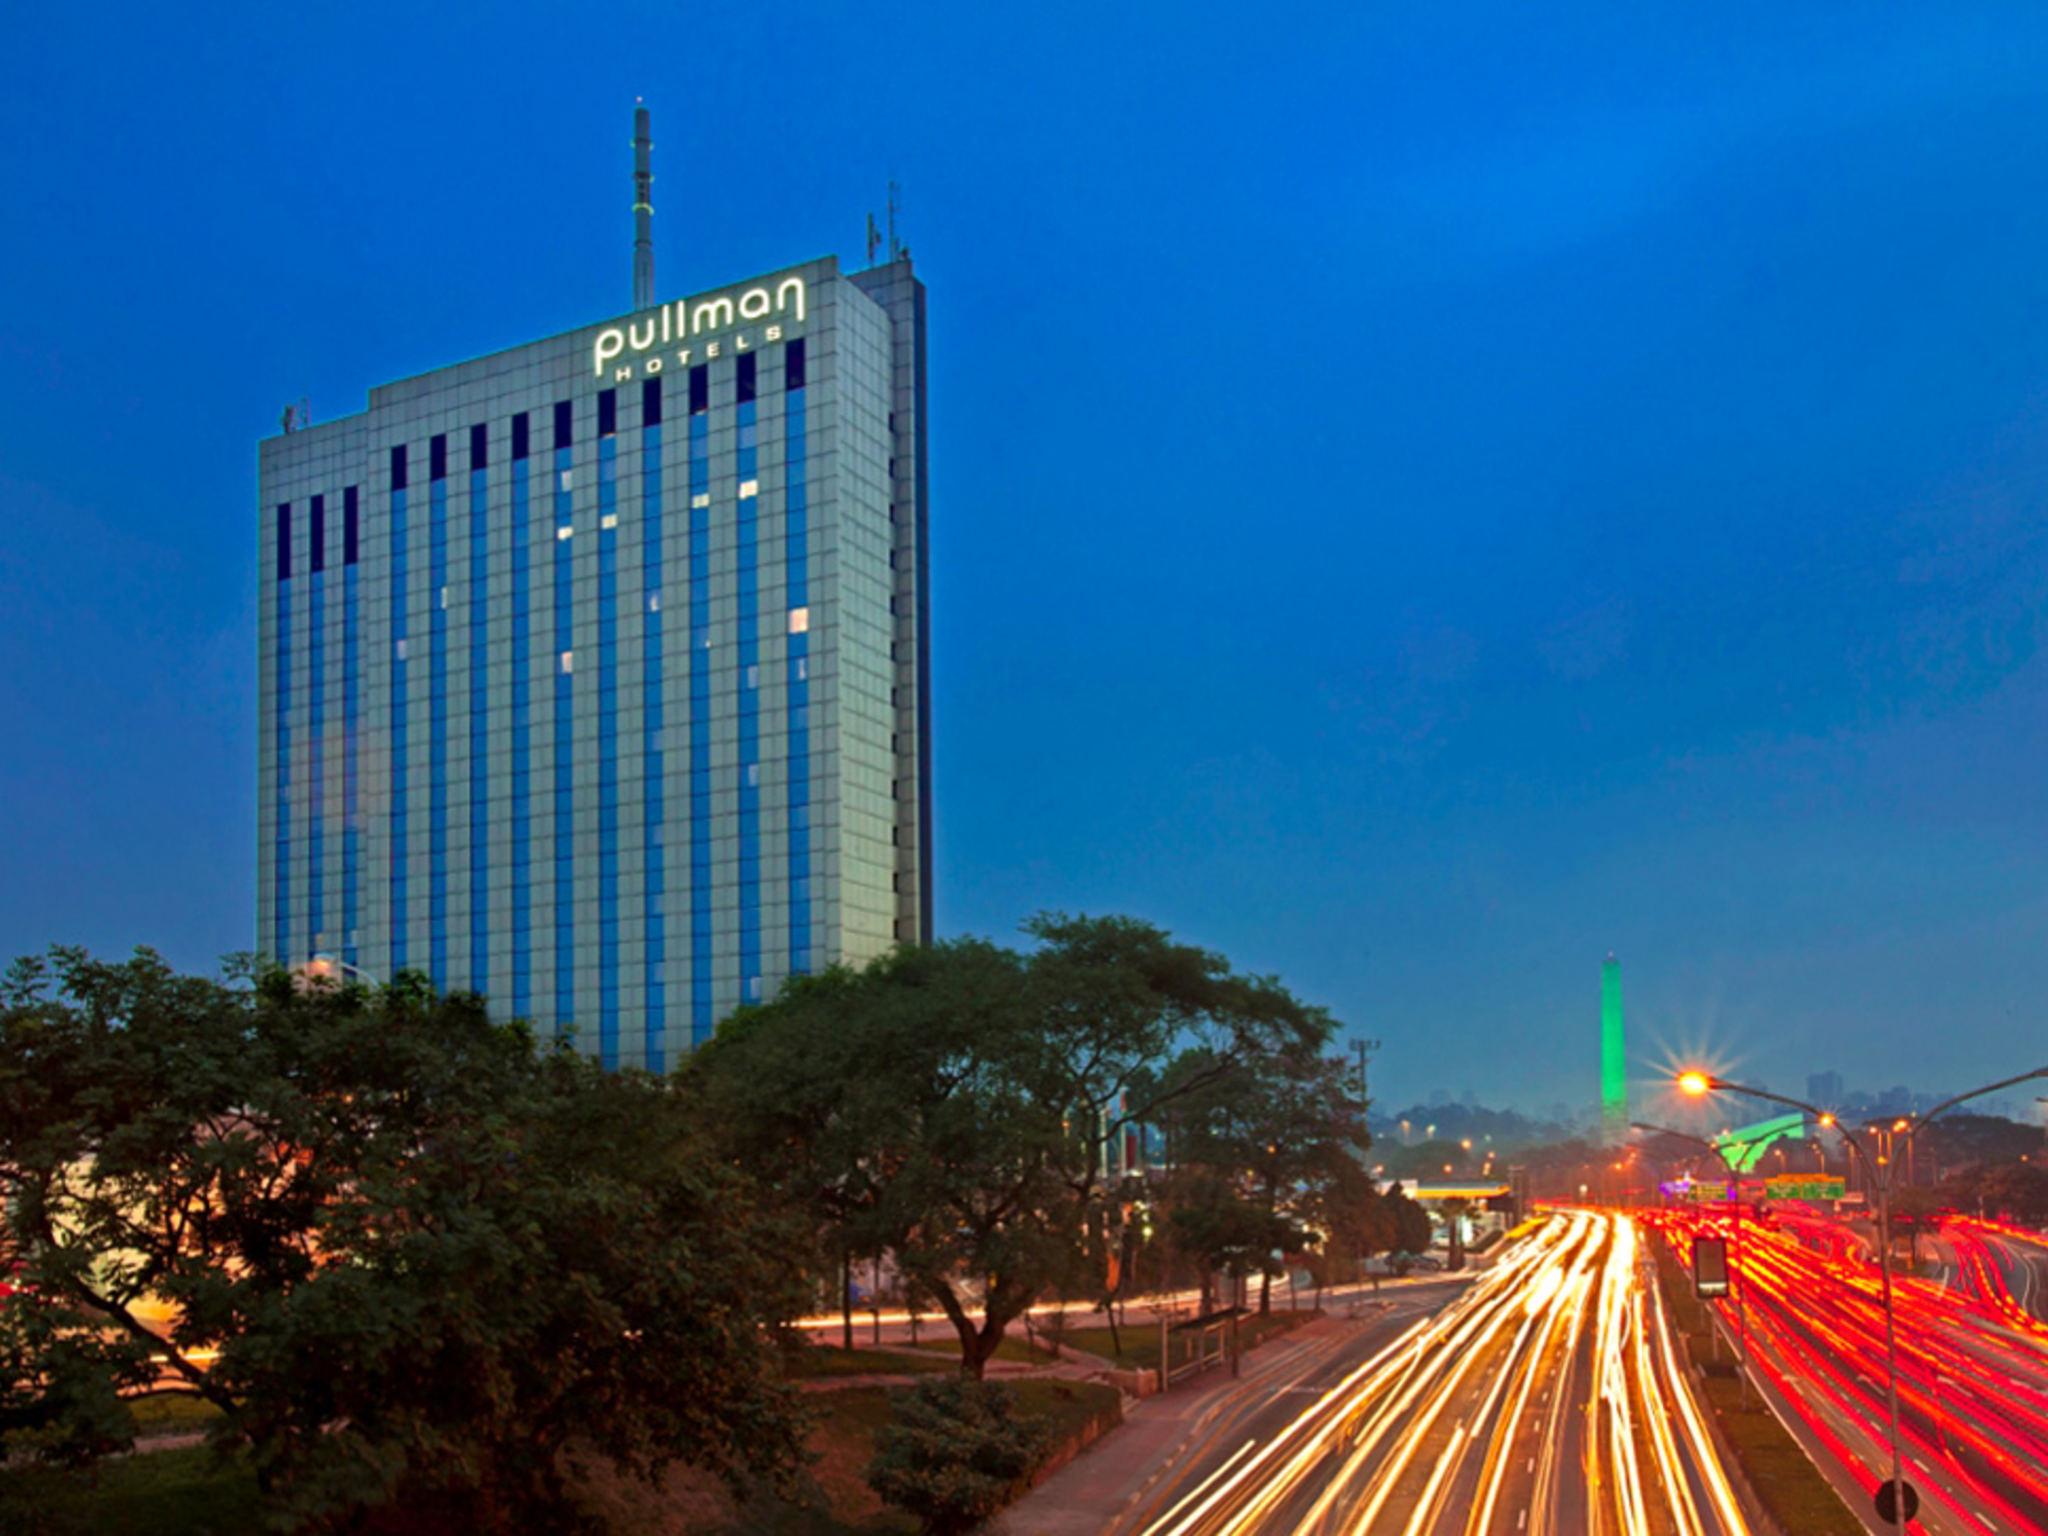 Hotel – Pullman São Paulo Ibirapuera